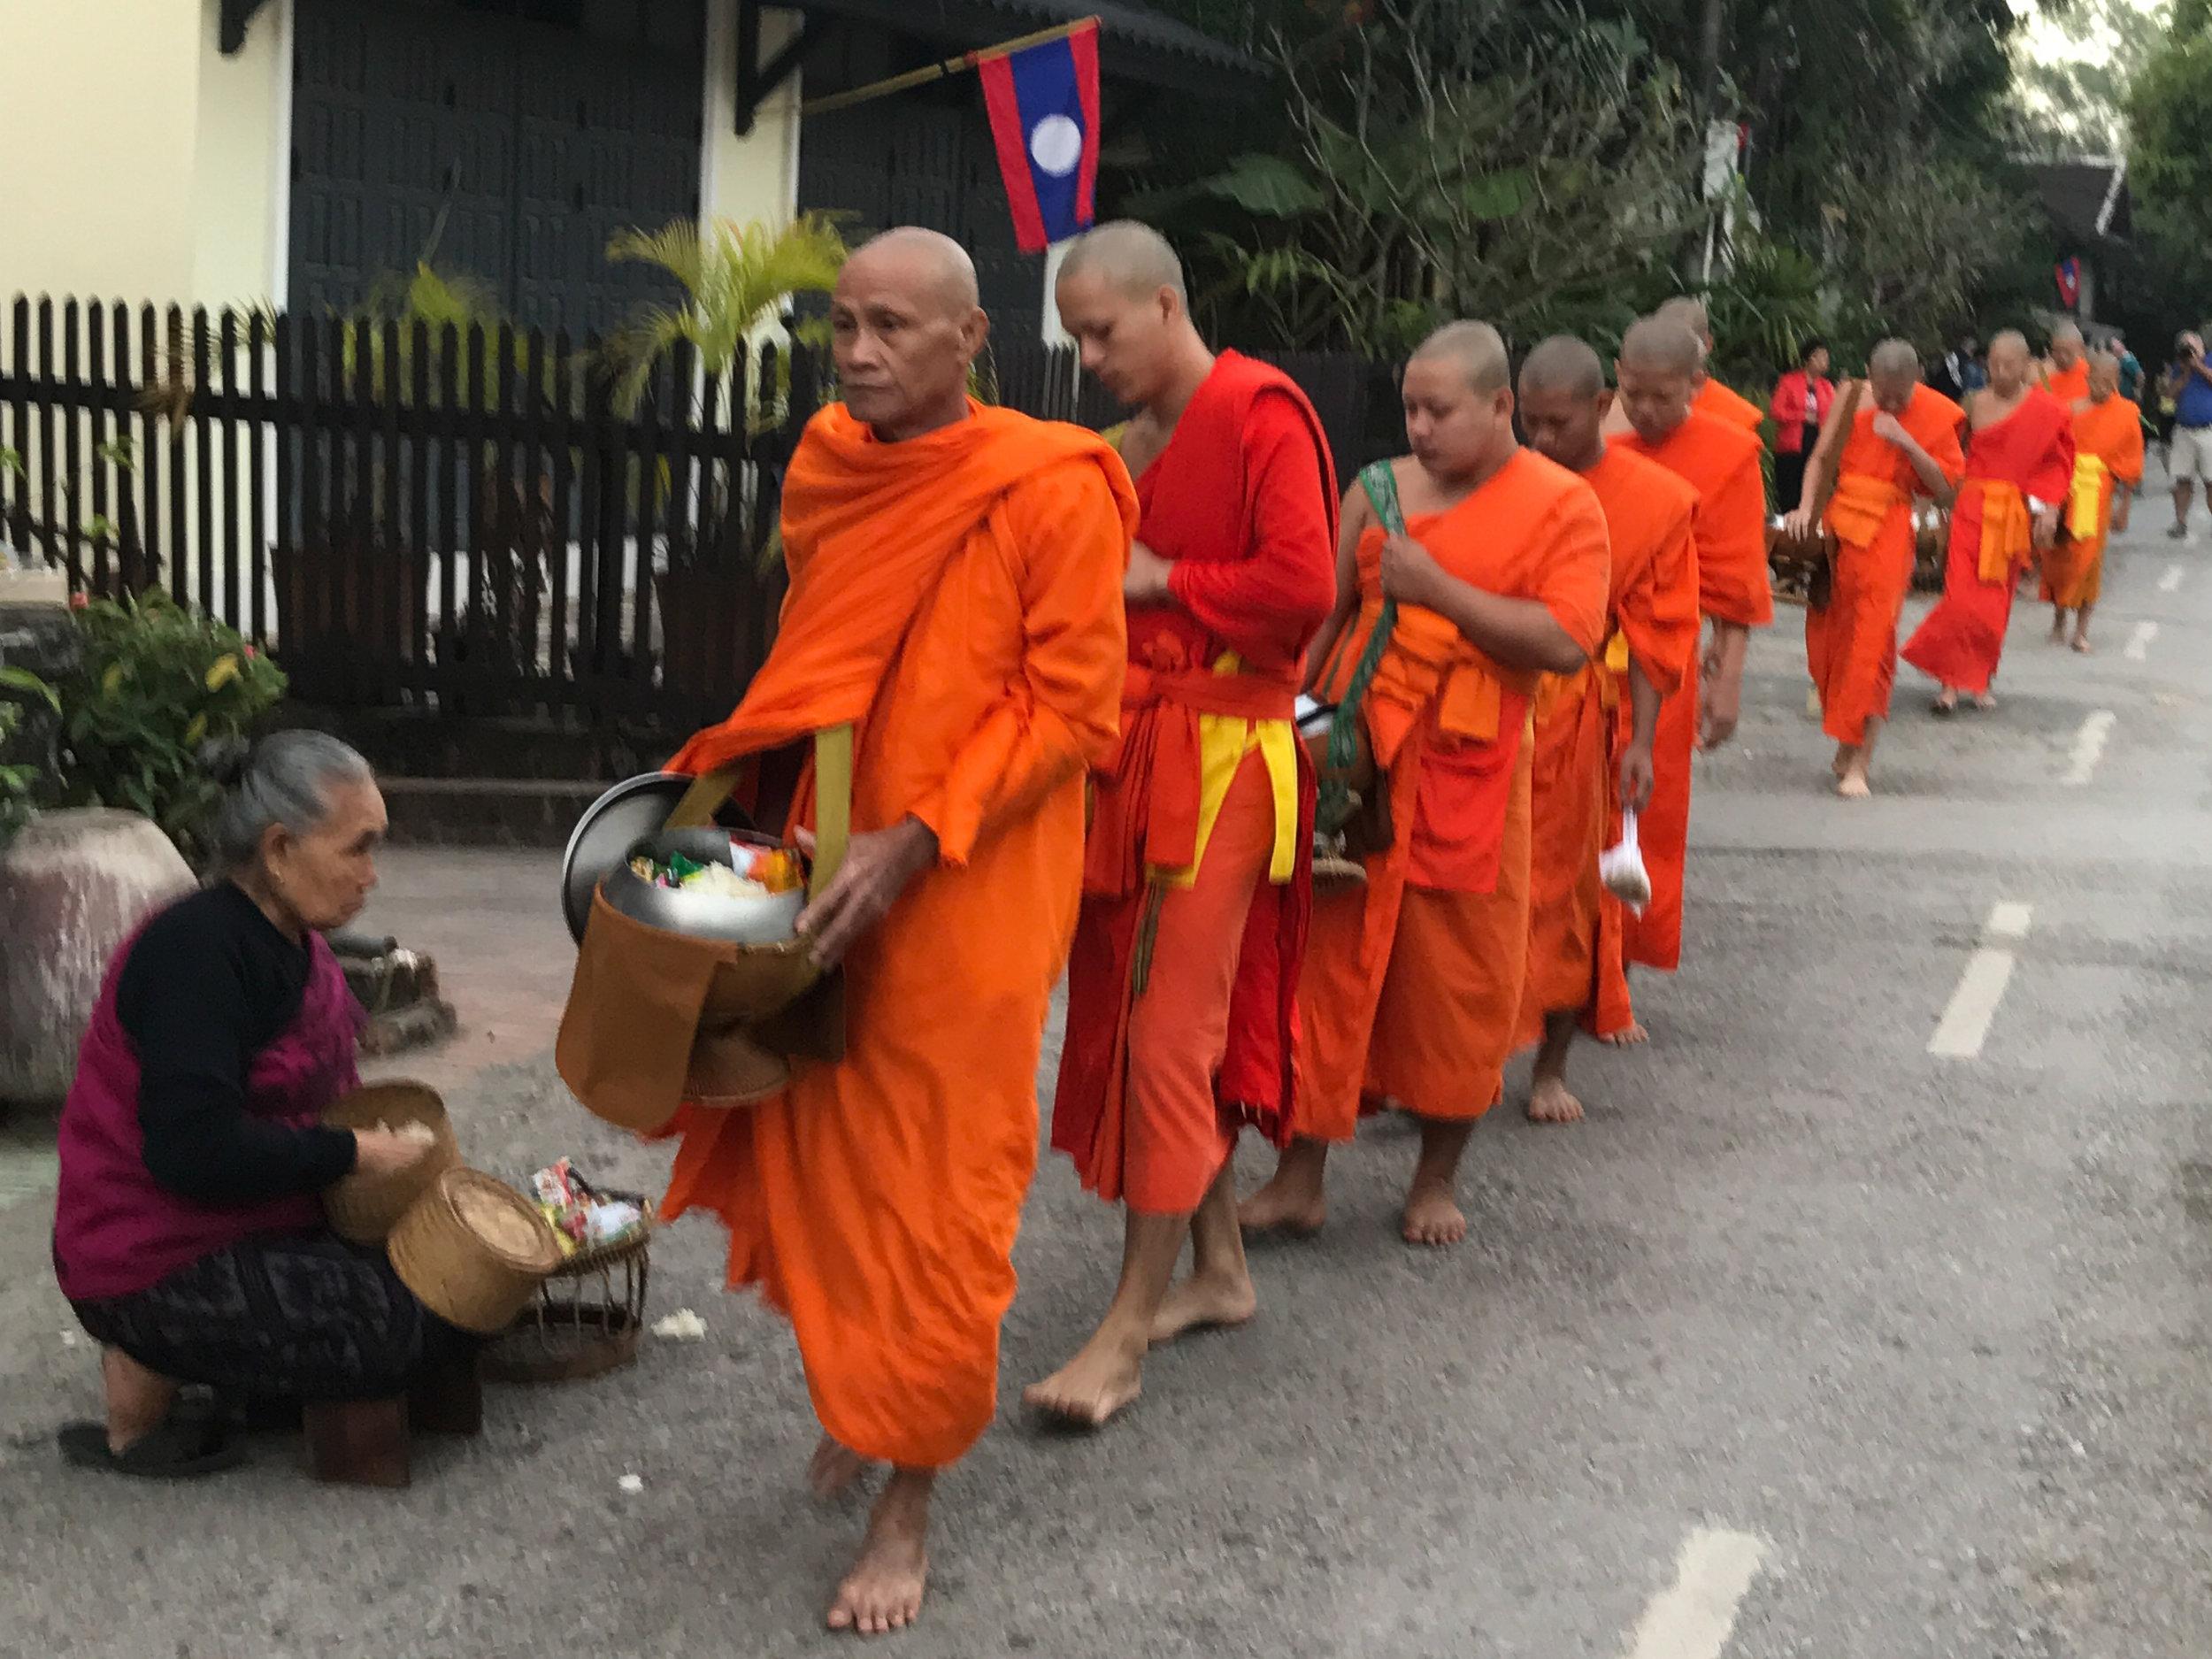 Monks sunrise almsgiving procession, Luang Prabang, Laos